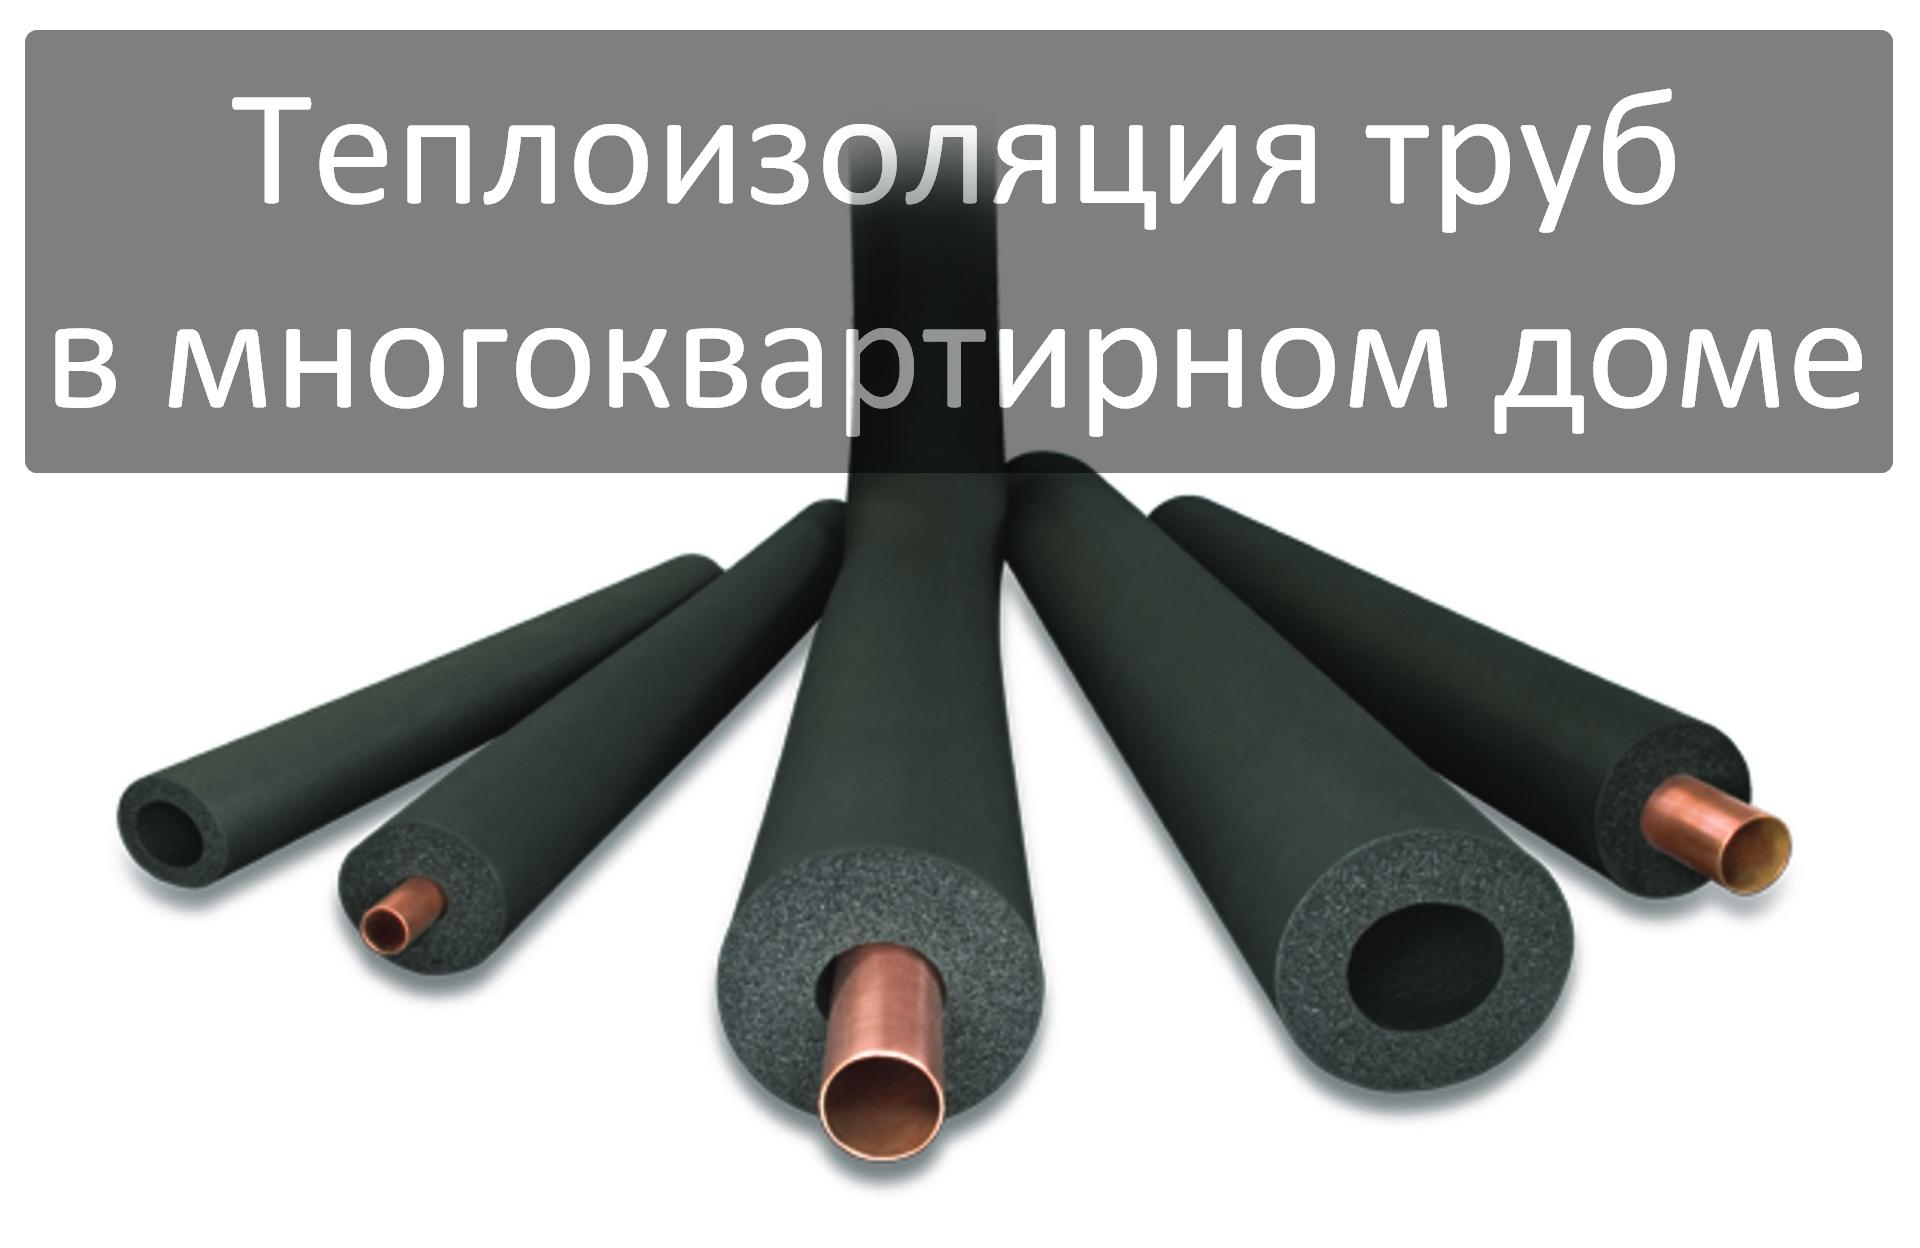 Теплоизоляция труб в многоквартирном доме